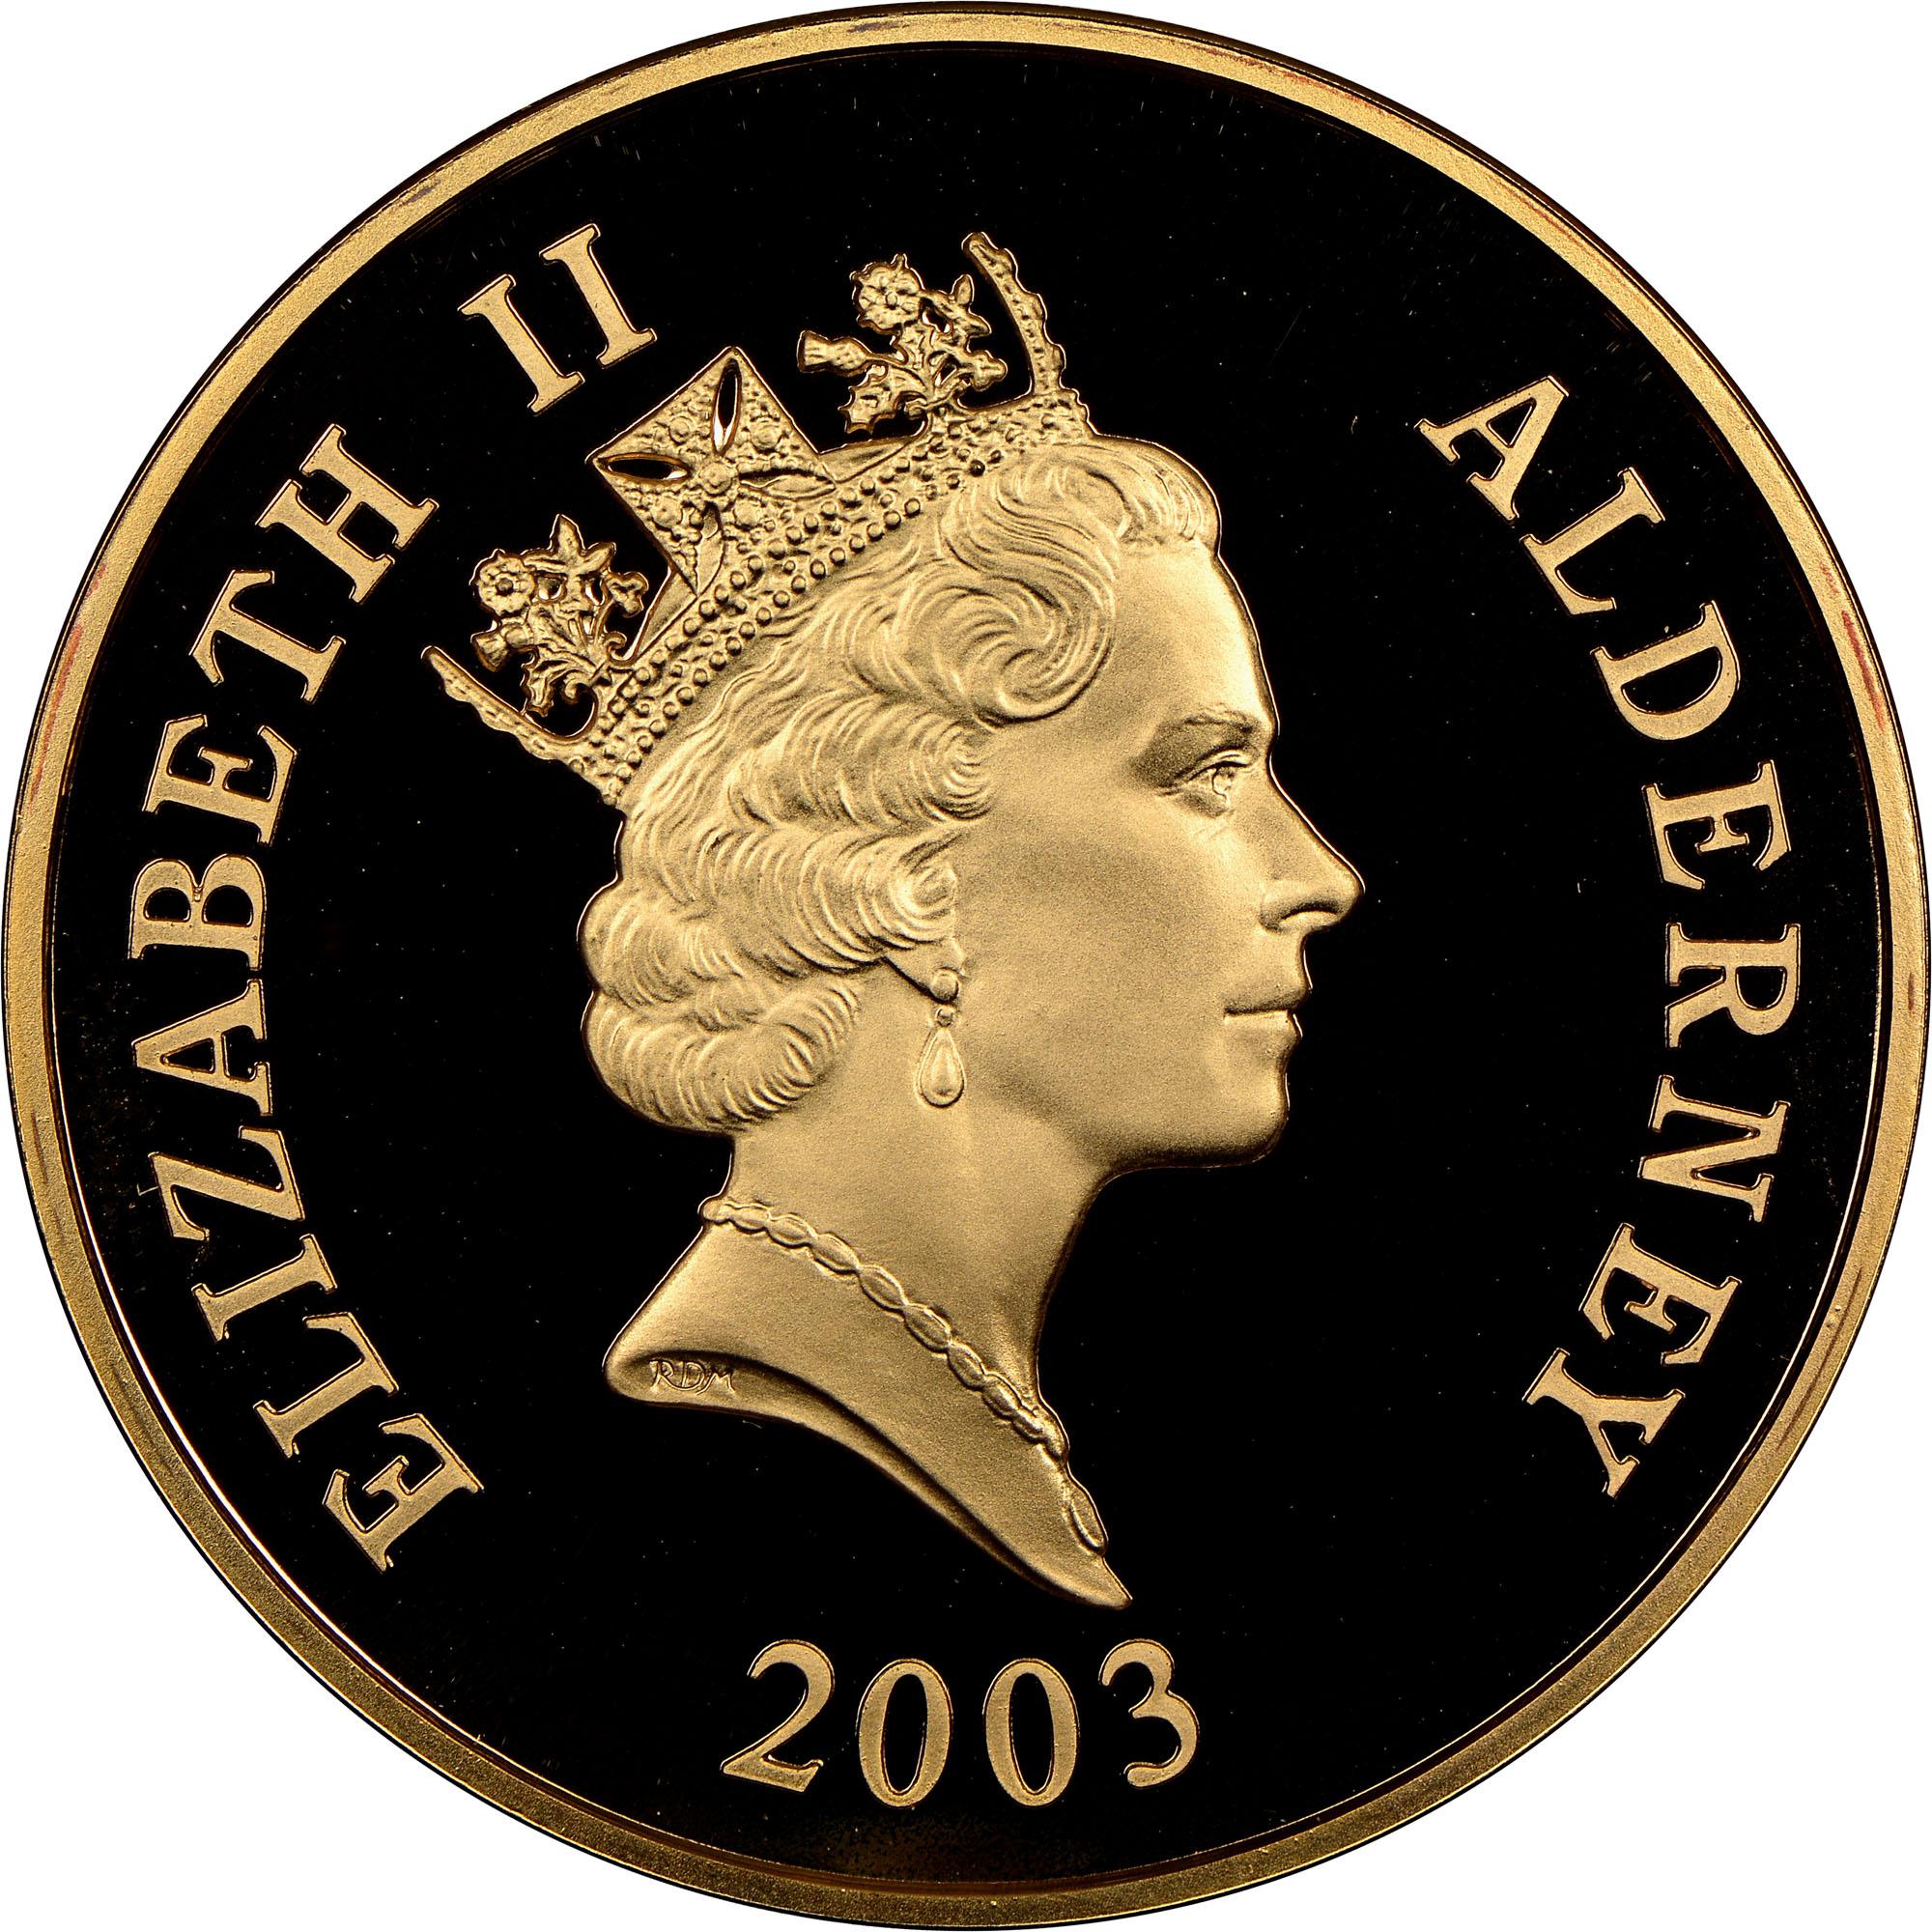 2003 Alderney 5 Pounds obverse